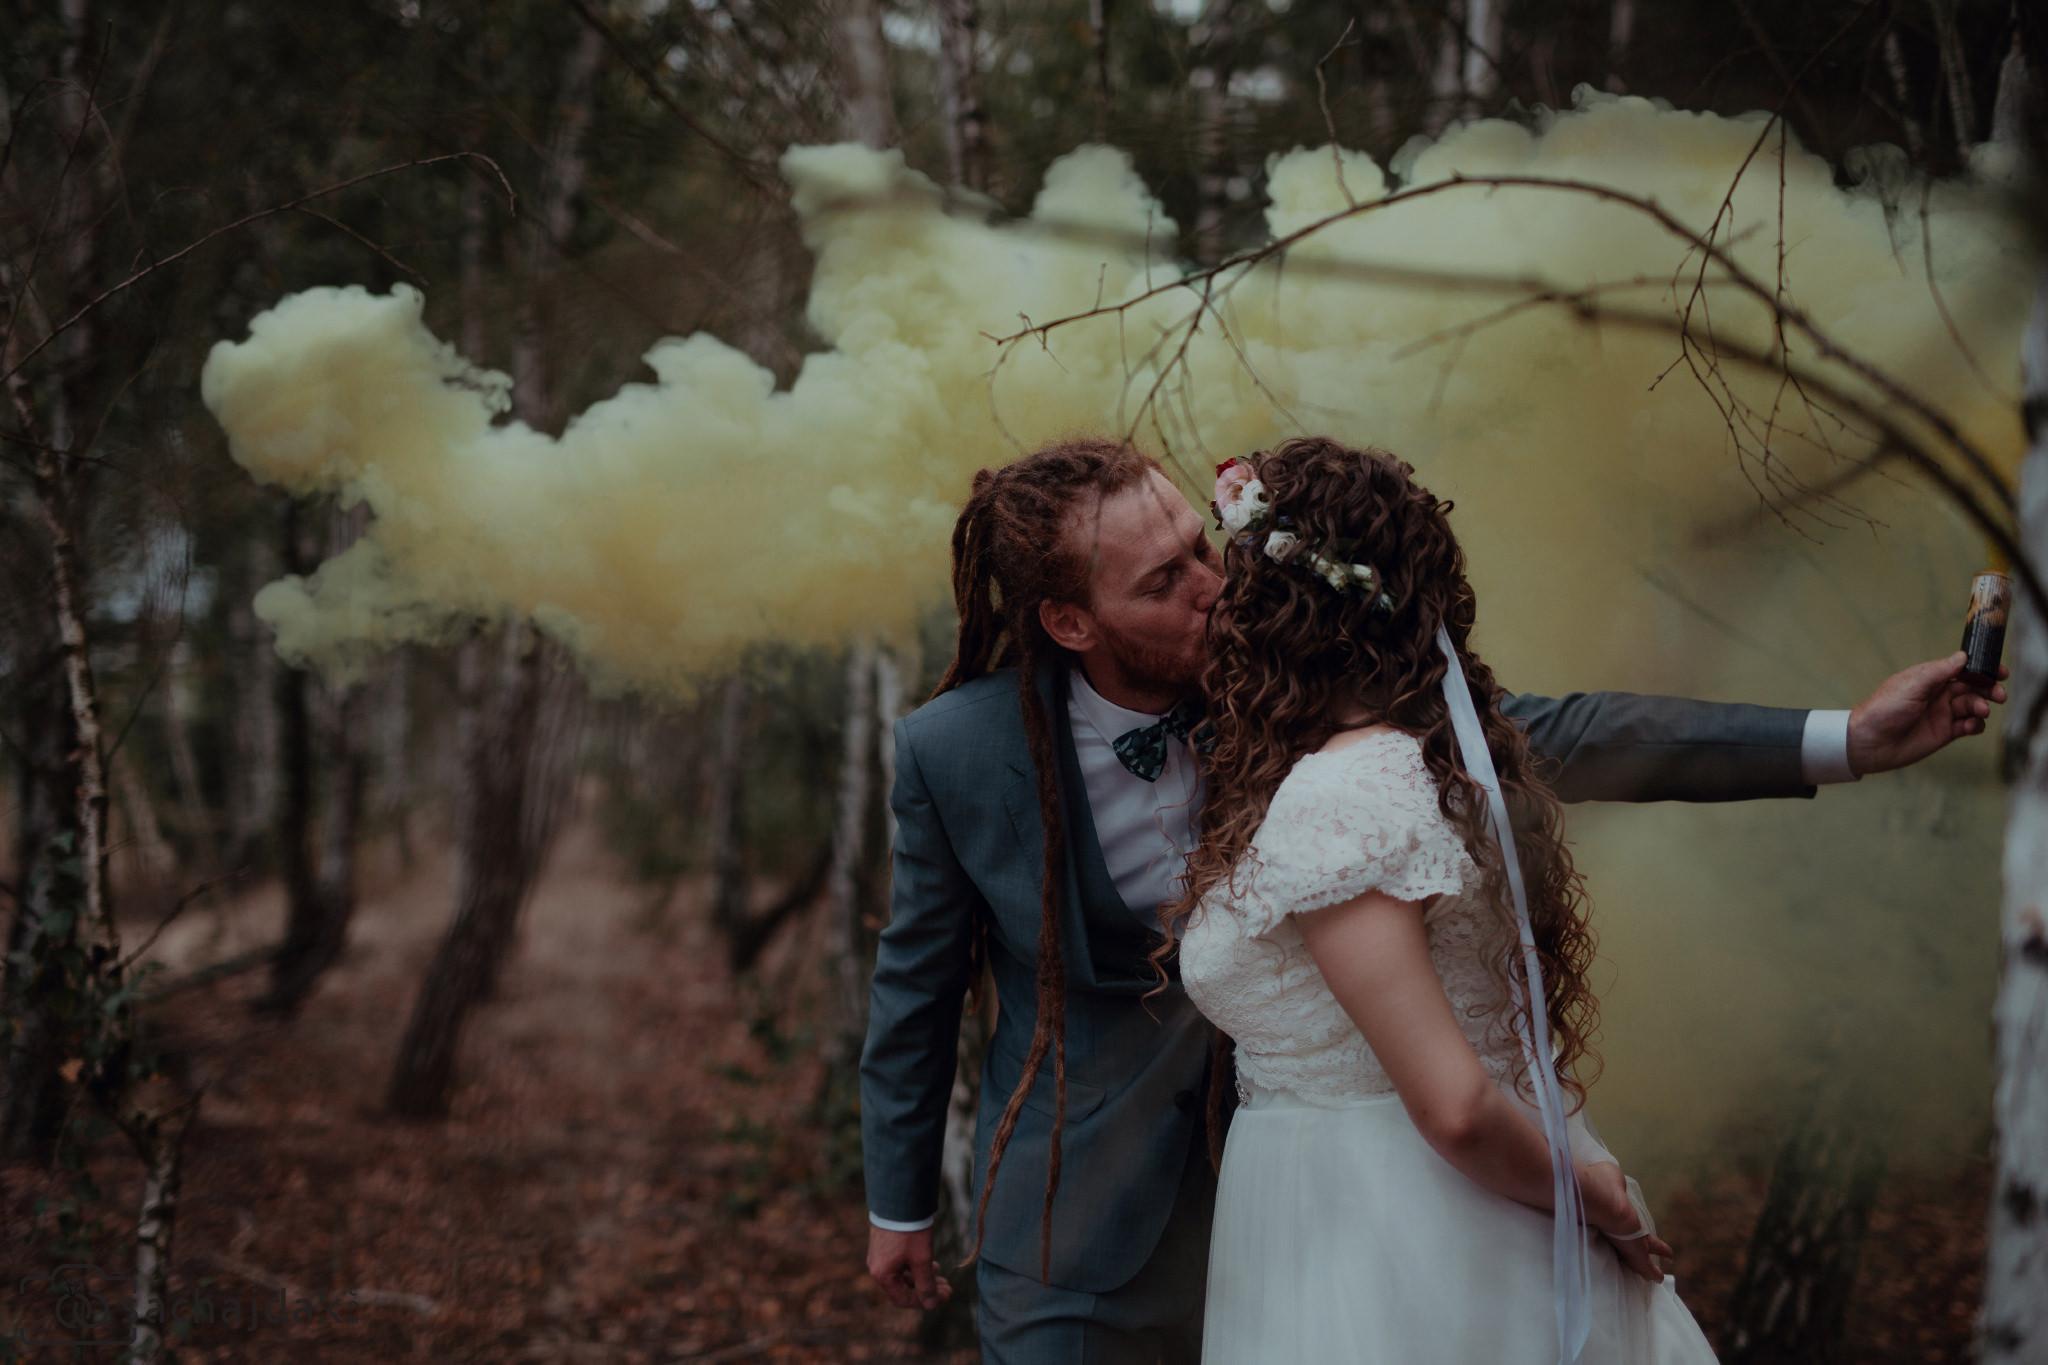 Sesja ślubna podczas wesela